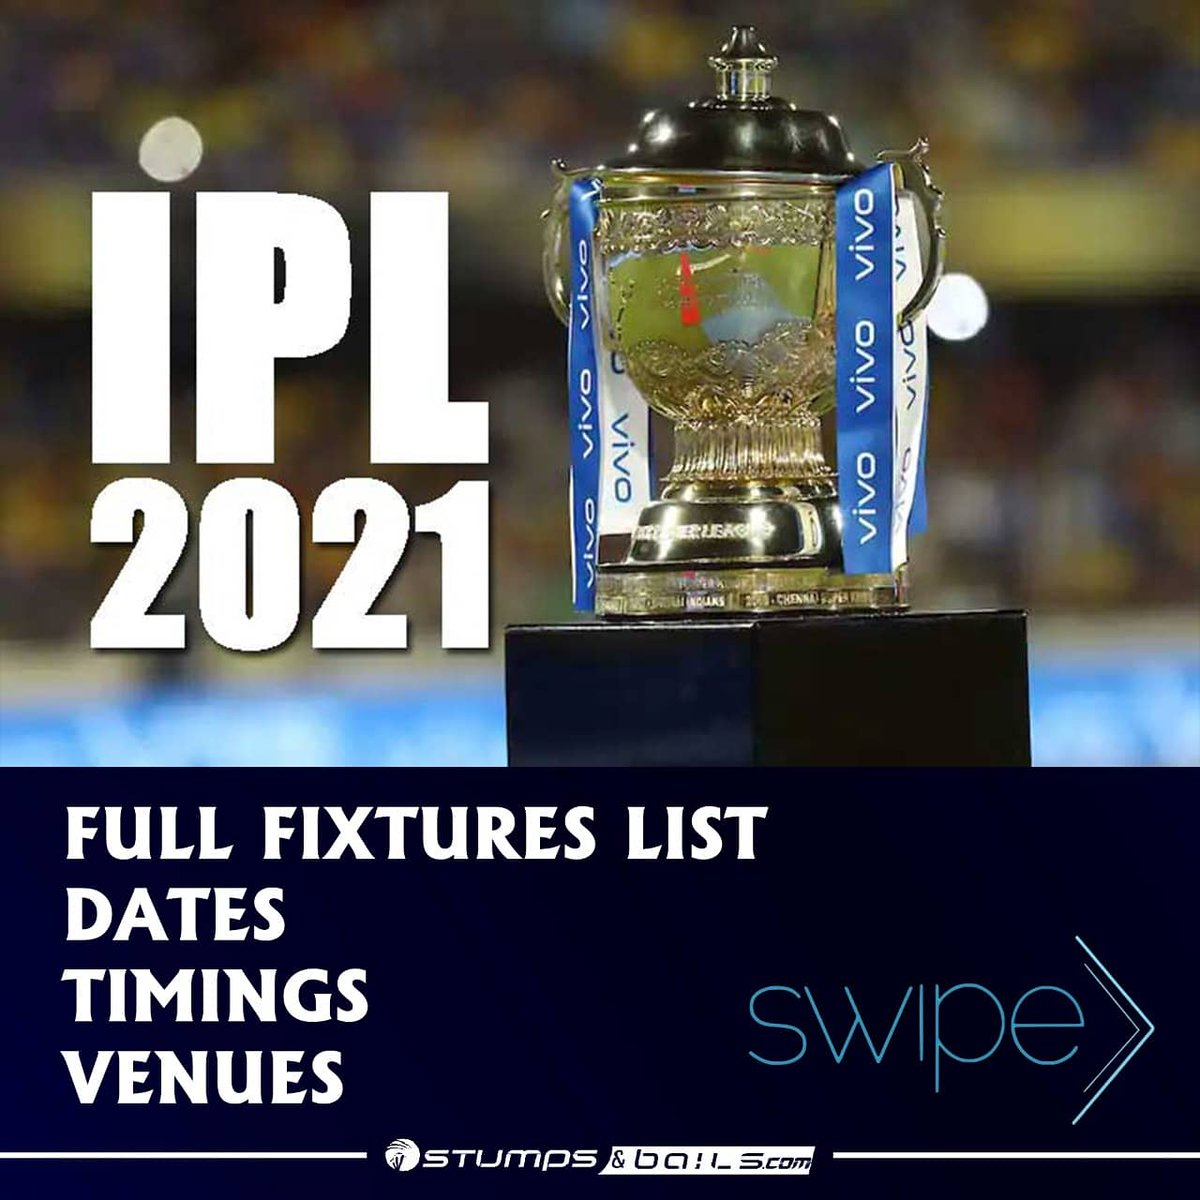 IPL 2021 Detail Schedule  Follow us @stumpnbails #INDvsENG #Cricket #csk #rr #rcb #punjabkings #kkr #mi #dc #srh #ipl #ipl2021 #VijayHazareTrophy #indianpremierleague #MSDhoni #ViratKohli